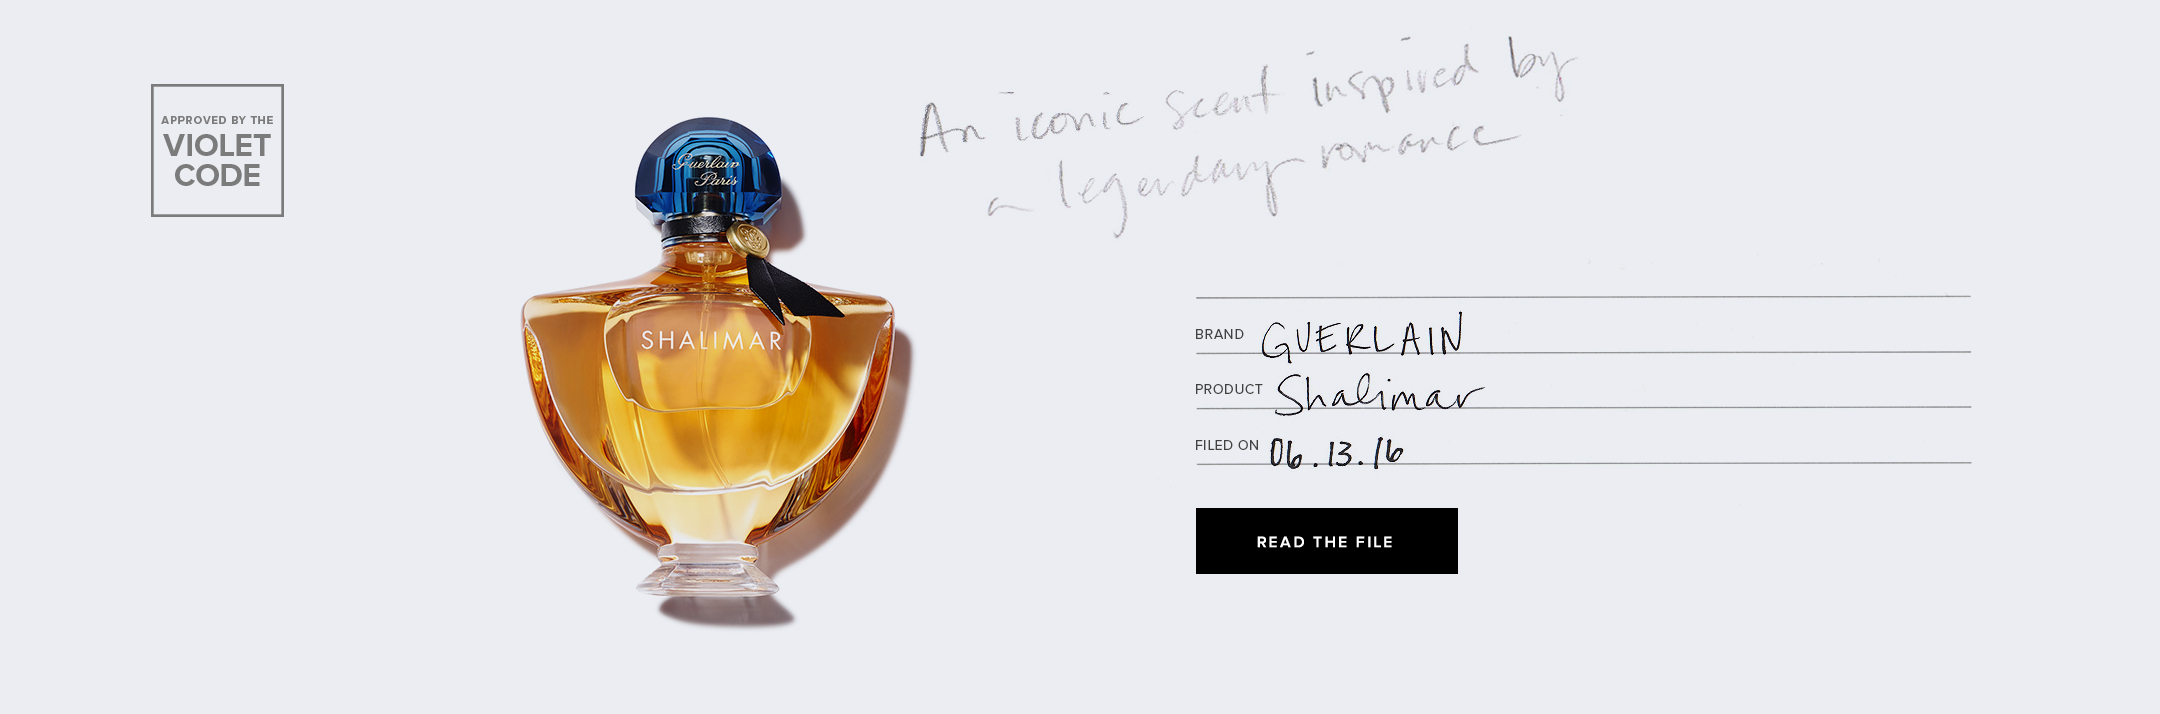 guerlain-shalimar-eau-de-parfum-interstitial-darkBG.jpg